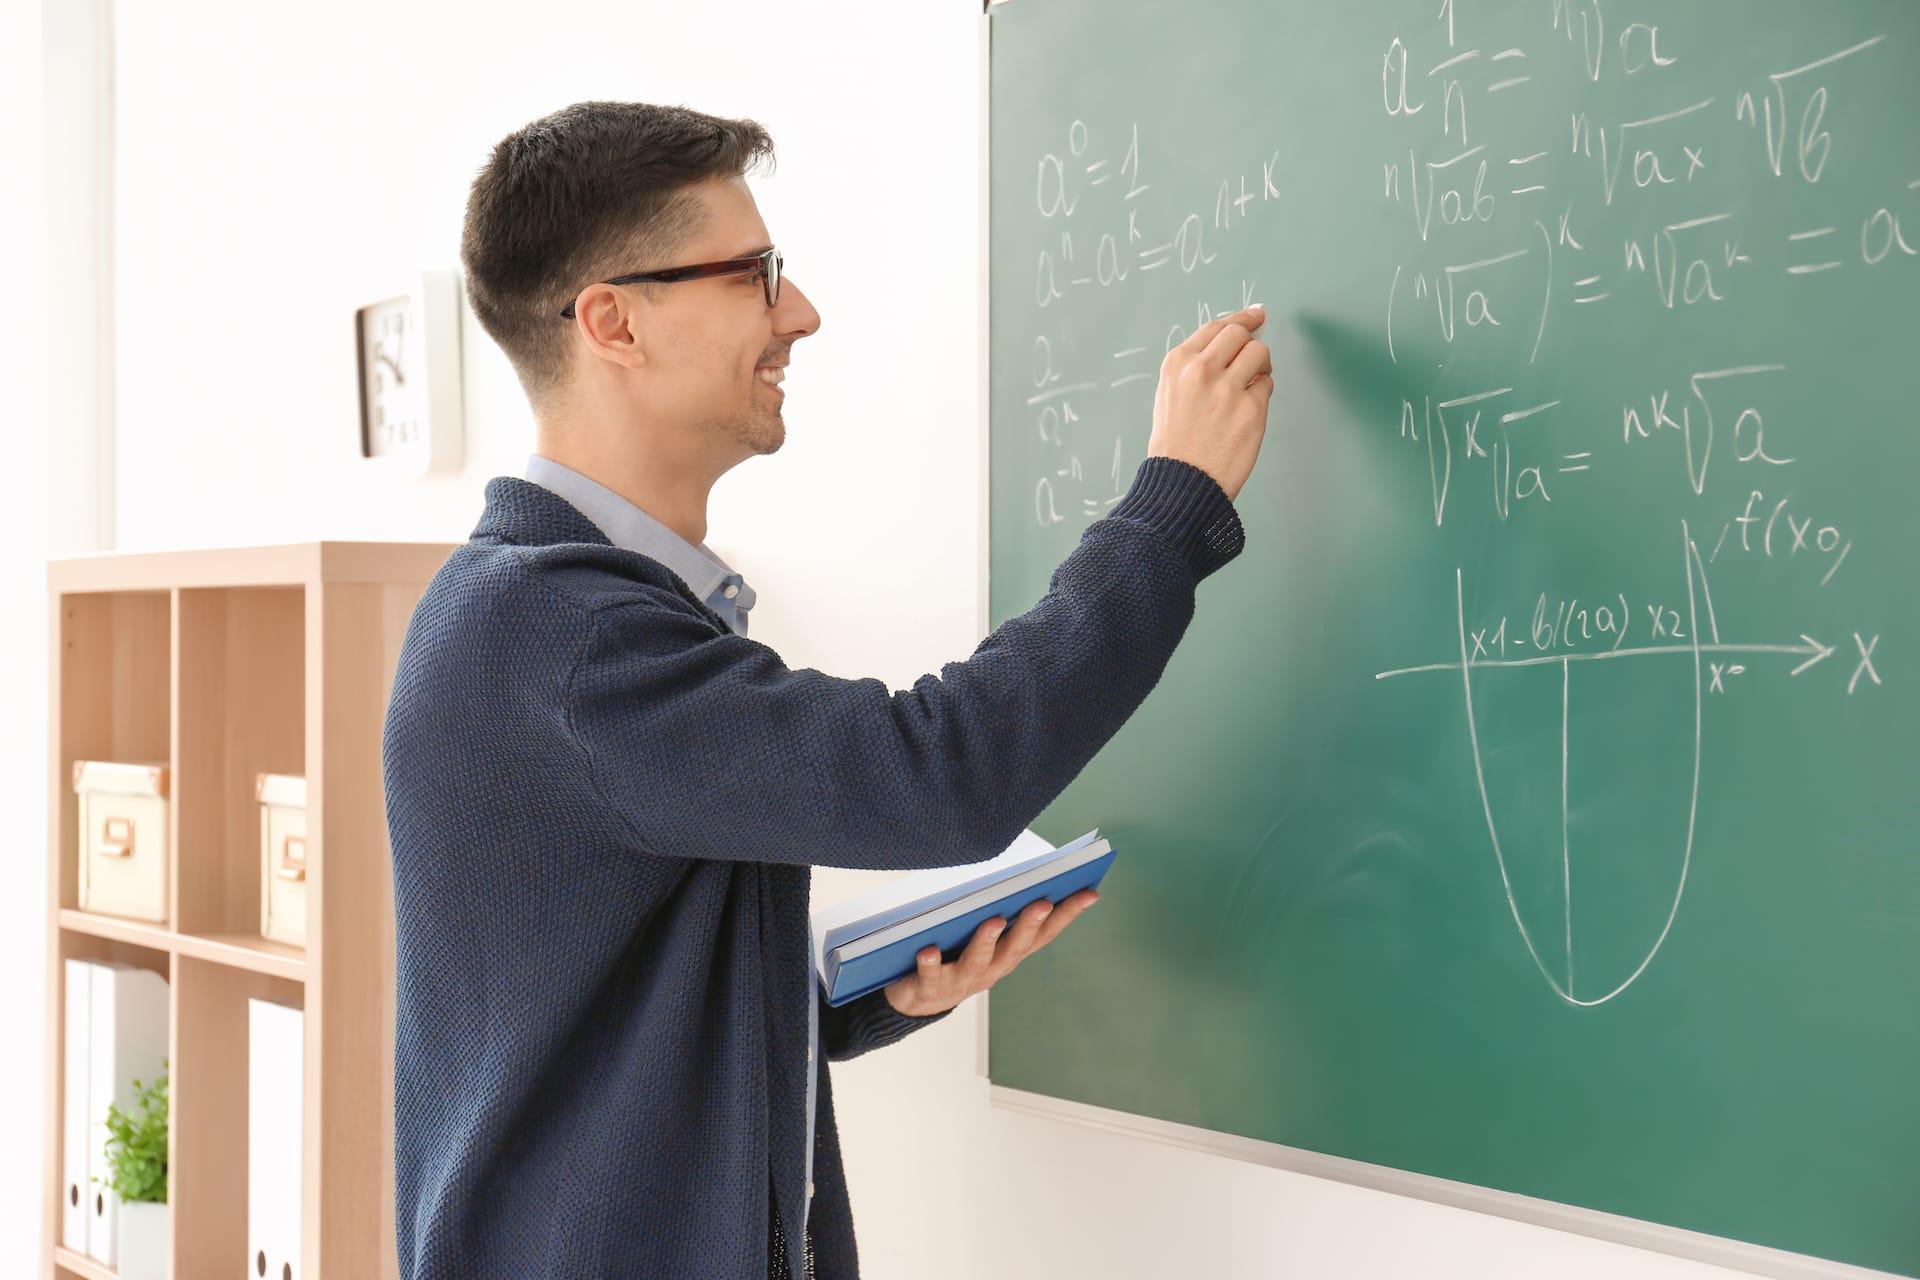 Hbo opleiding lerarenopleiding wiskunde for Opleiding tuinarchitectuur hbo